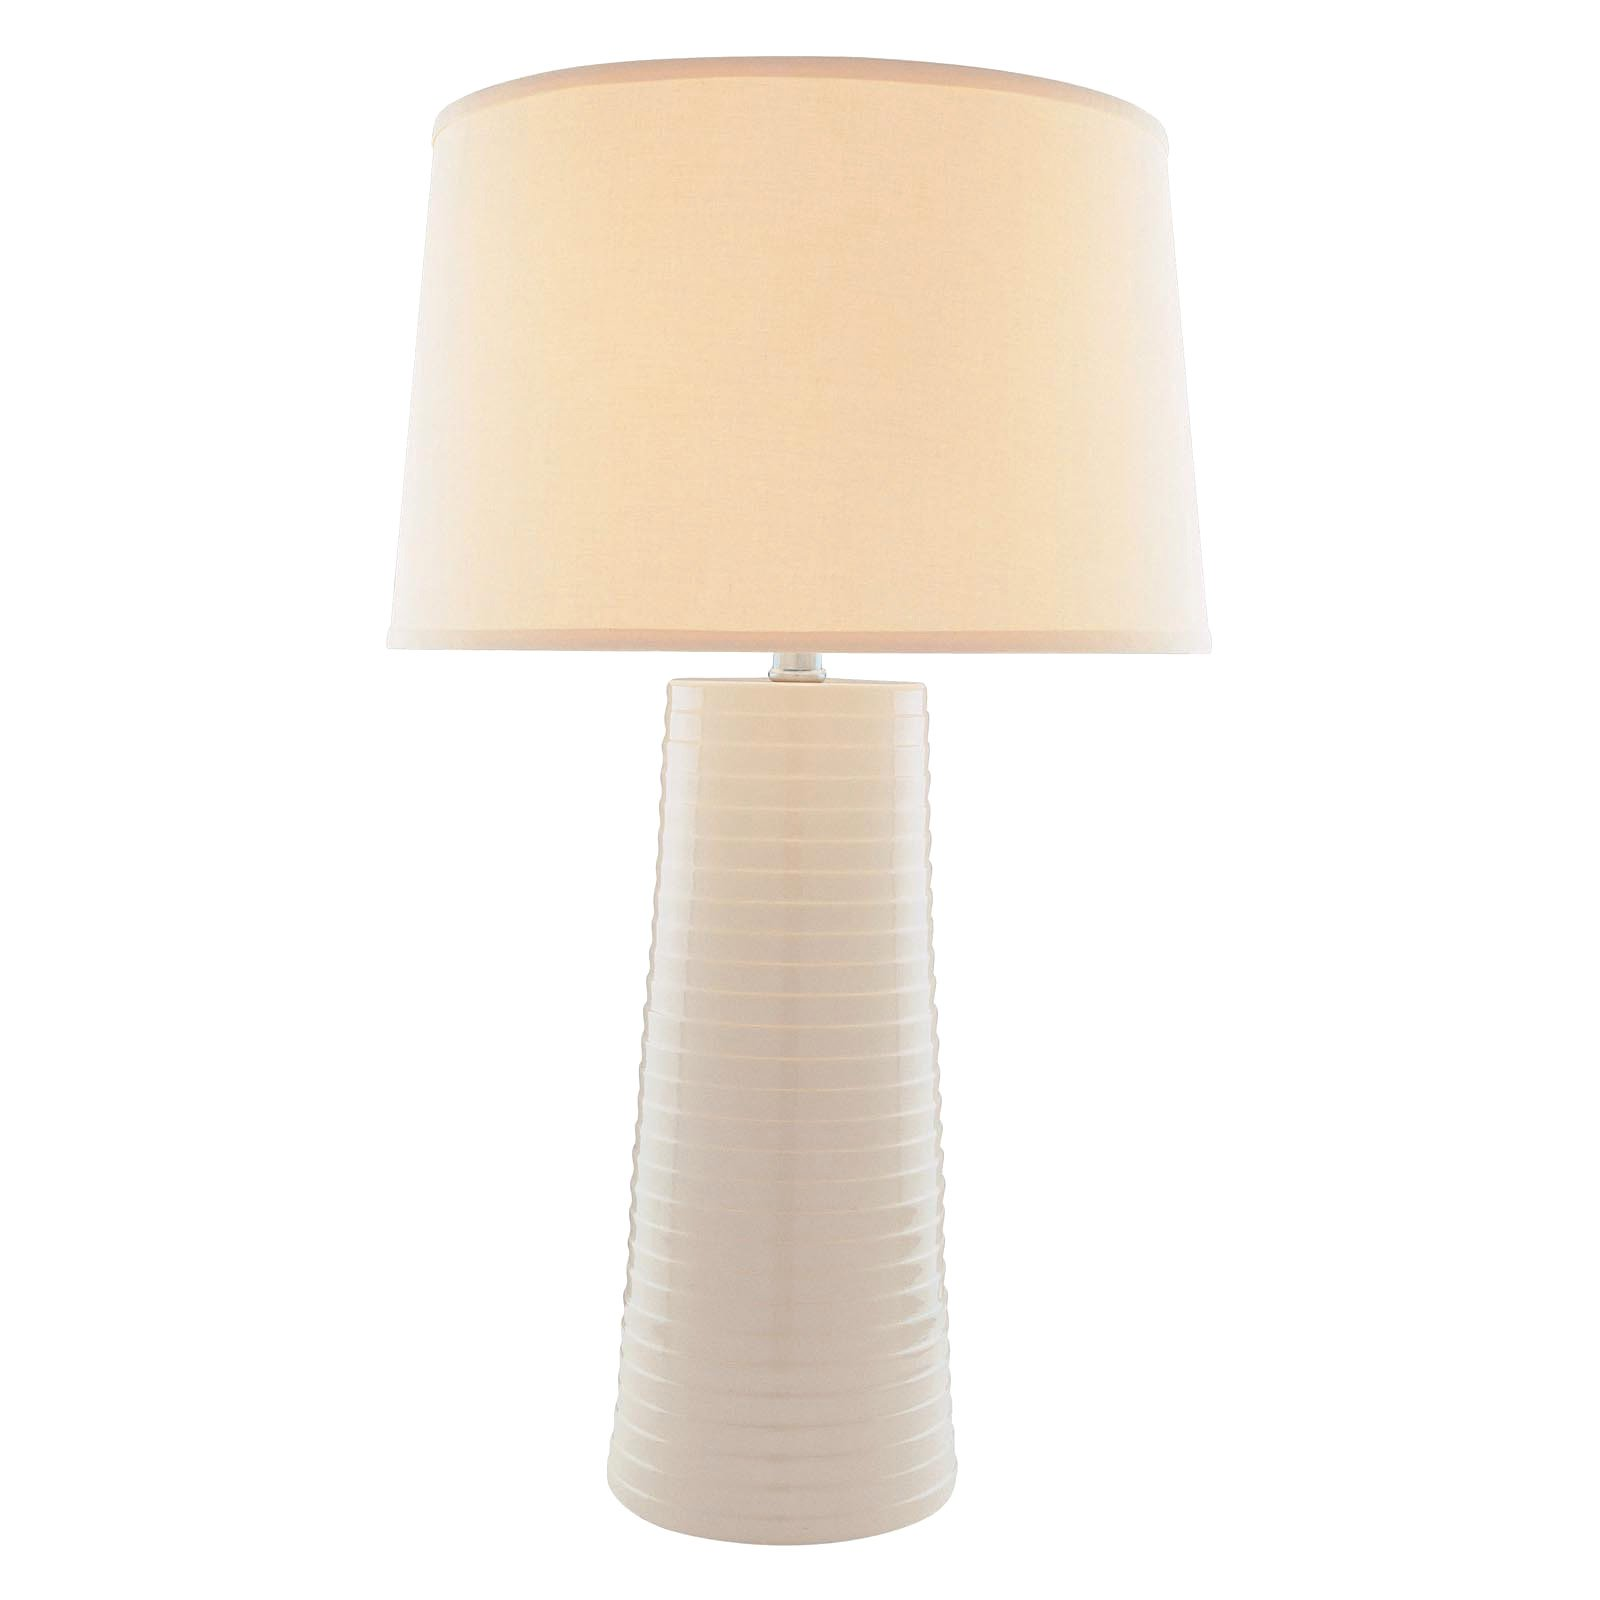 Lite Source LS-20830IVY Ashanti Table Lamp